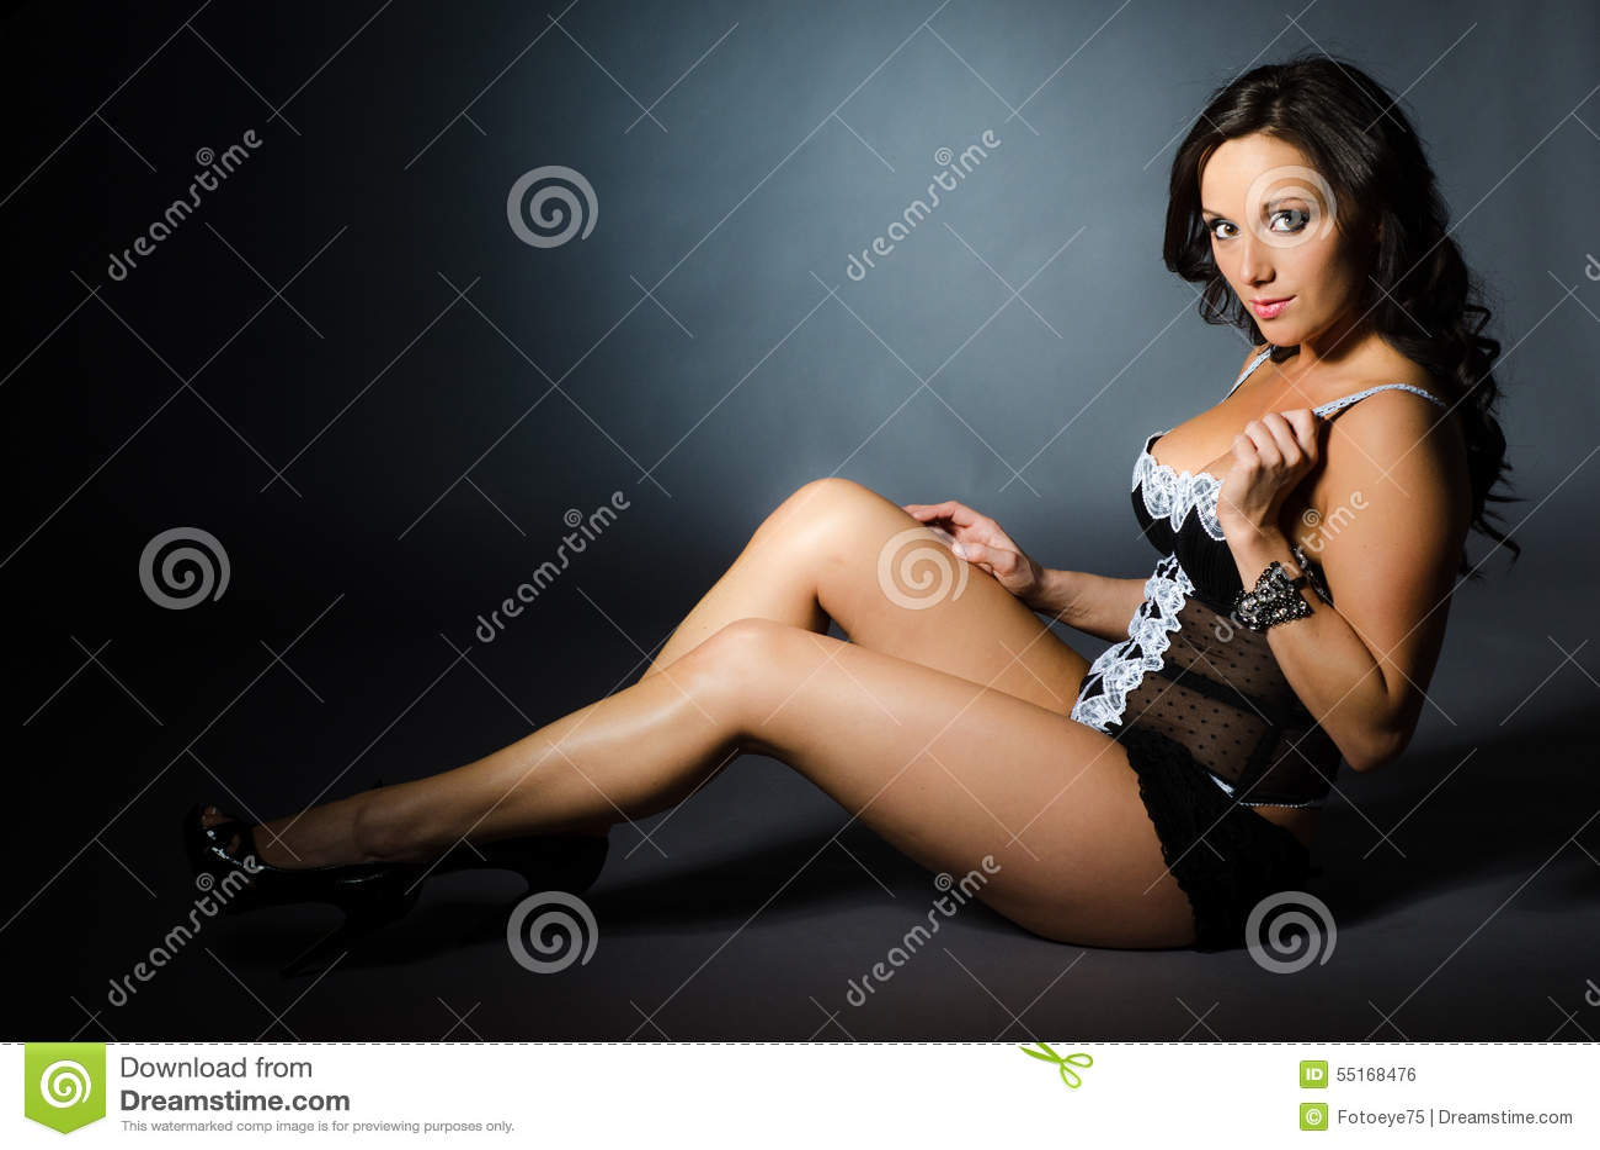 Full figured woman deepthroating